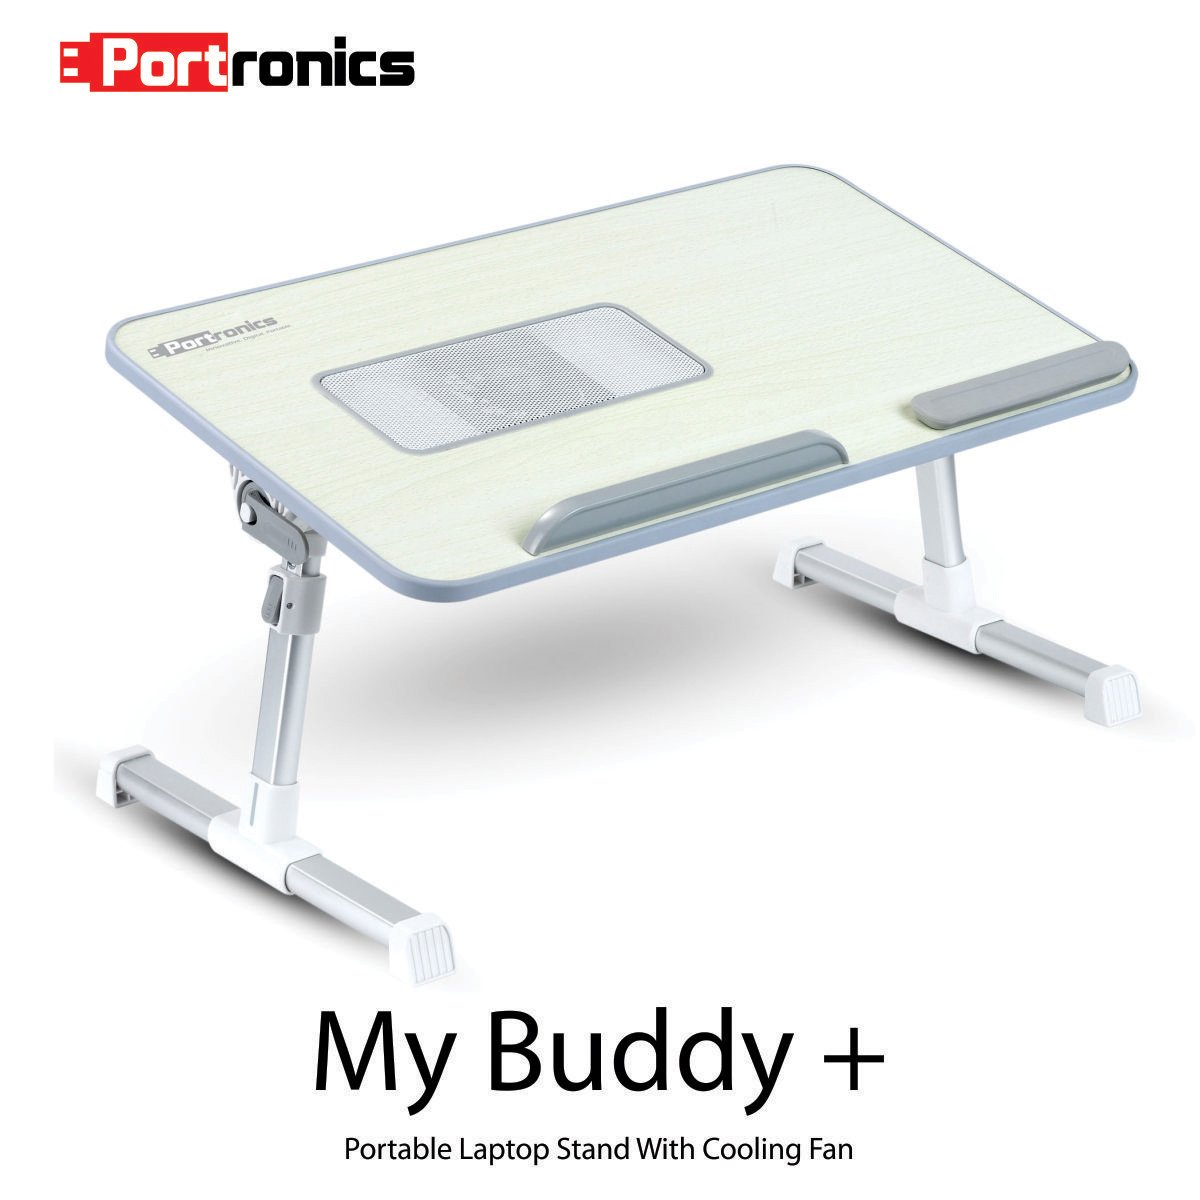 Portronics POR-704 Adjustable Laptop Table